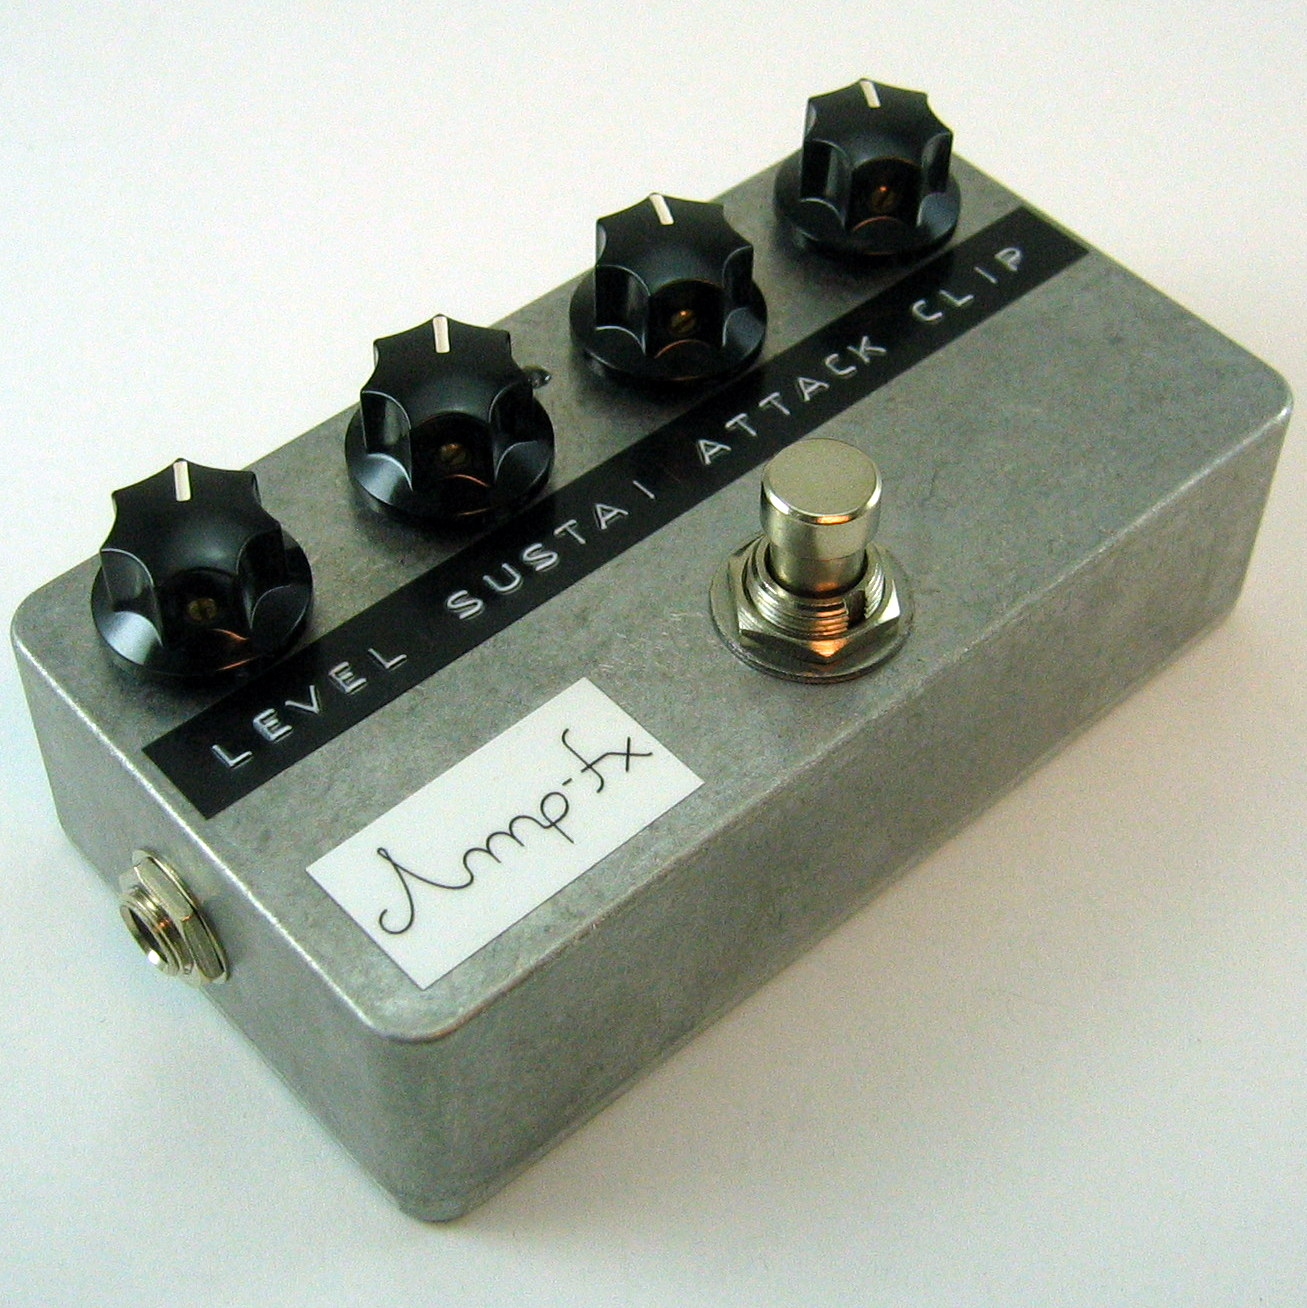 Amp-fx Keeley Ross C4 compressor